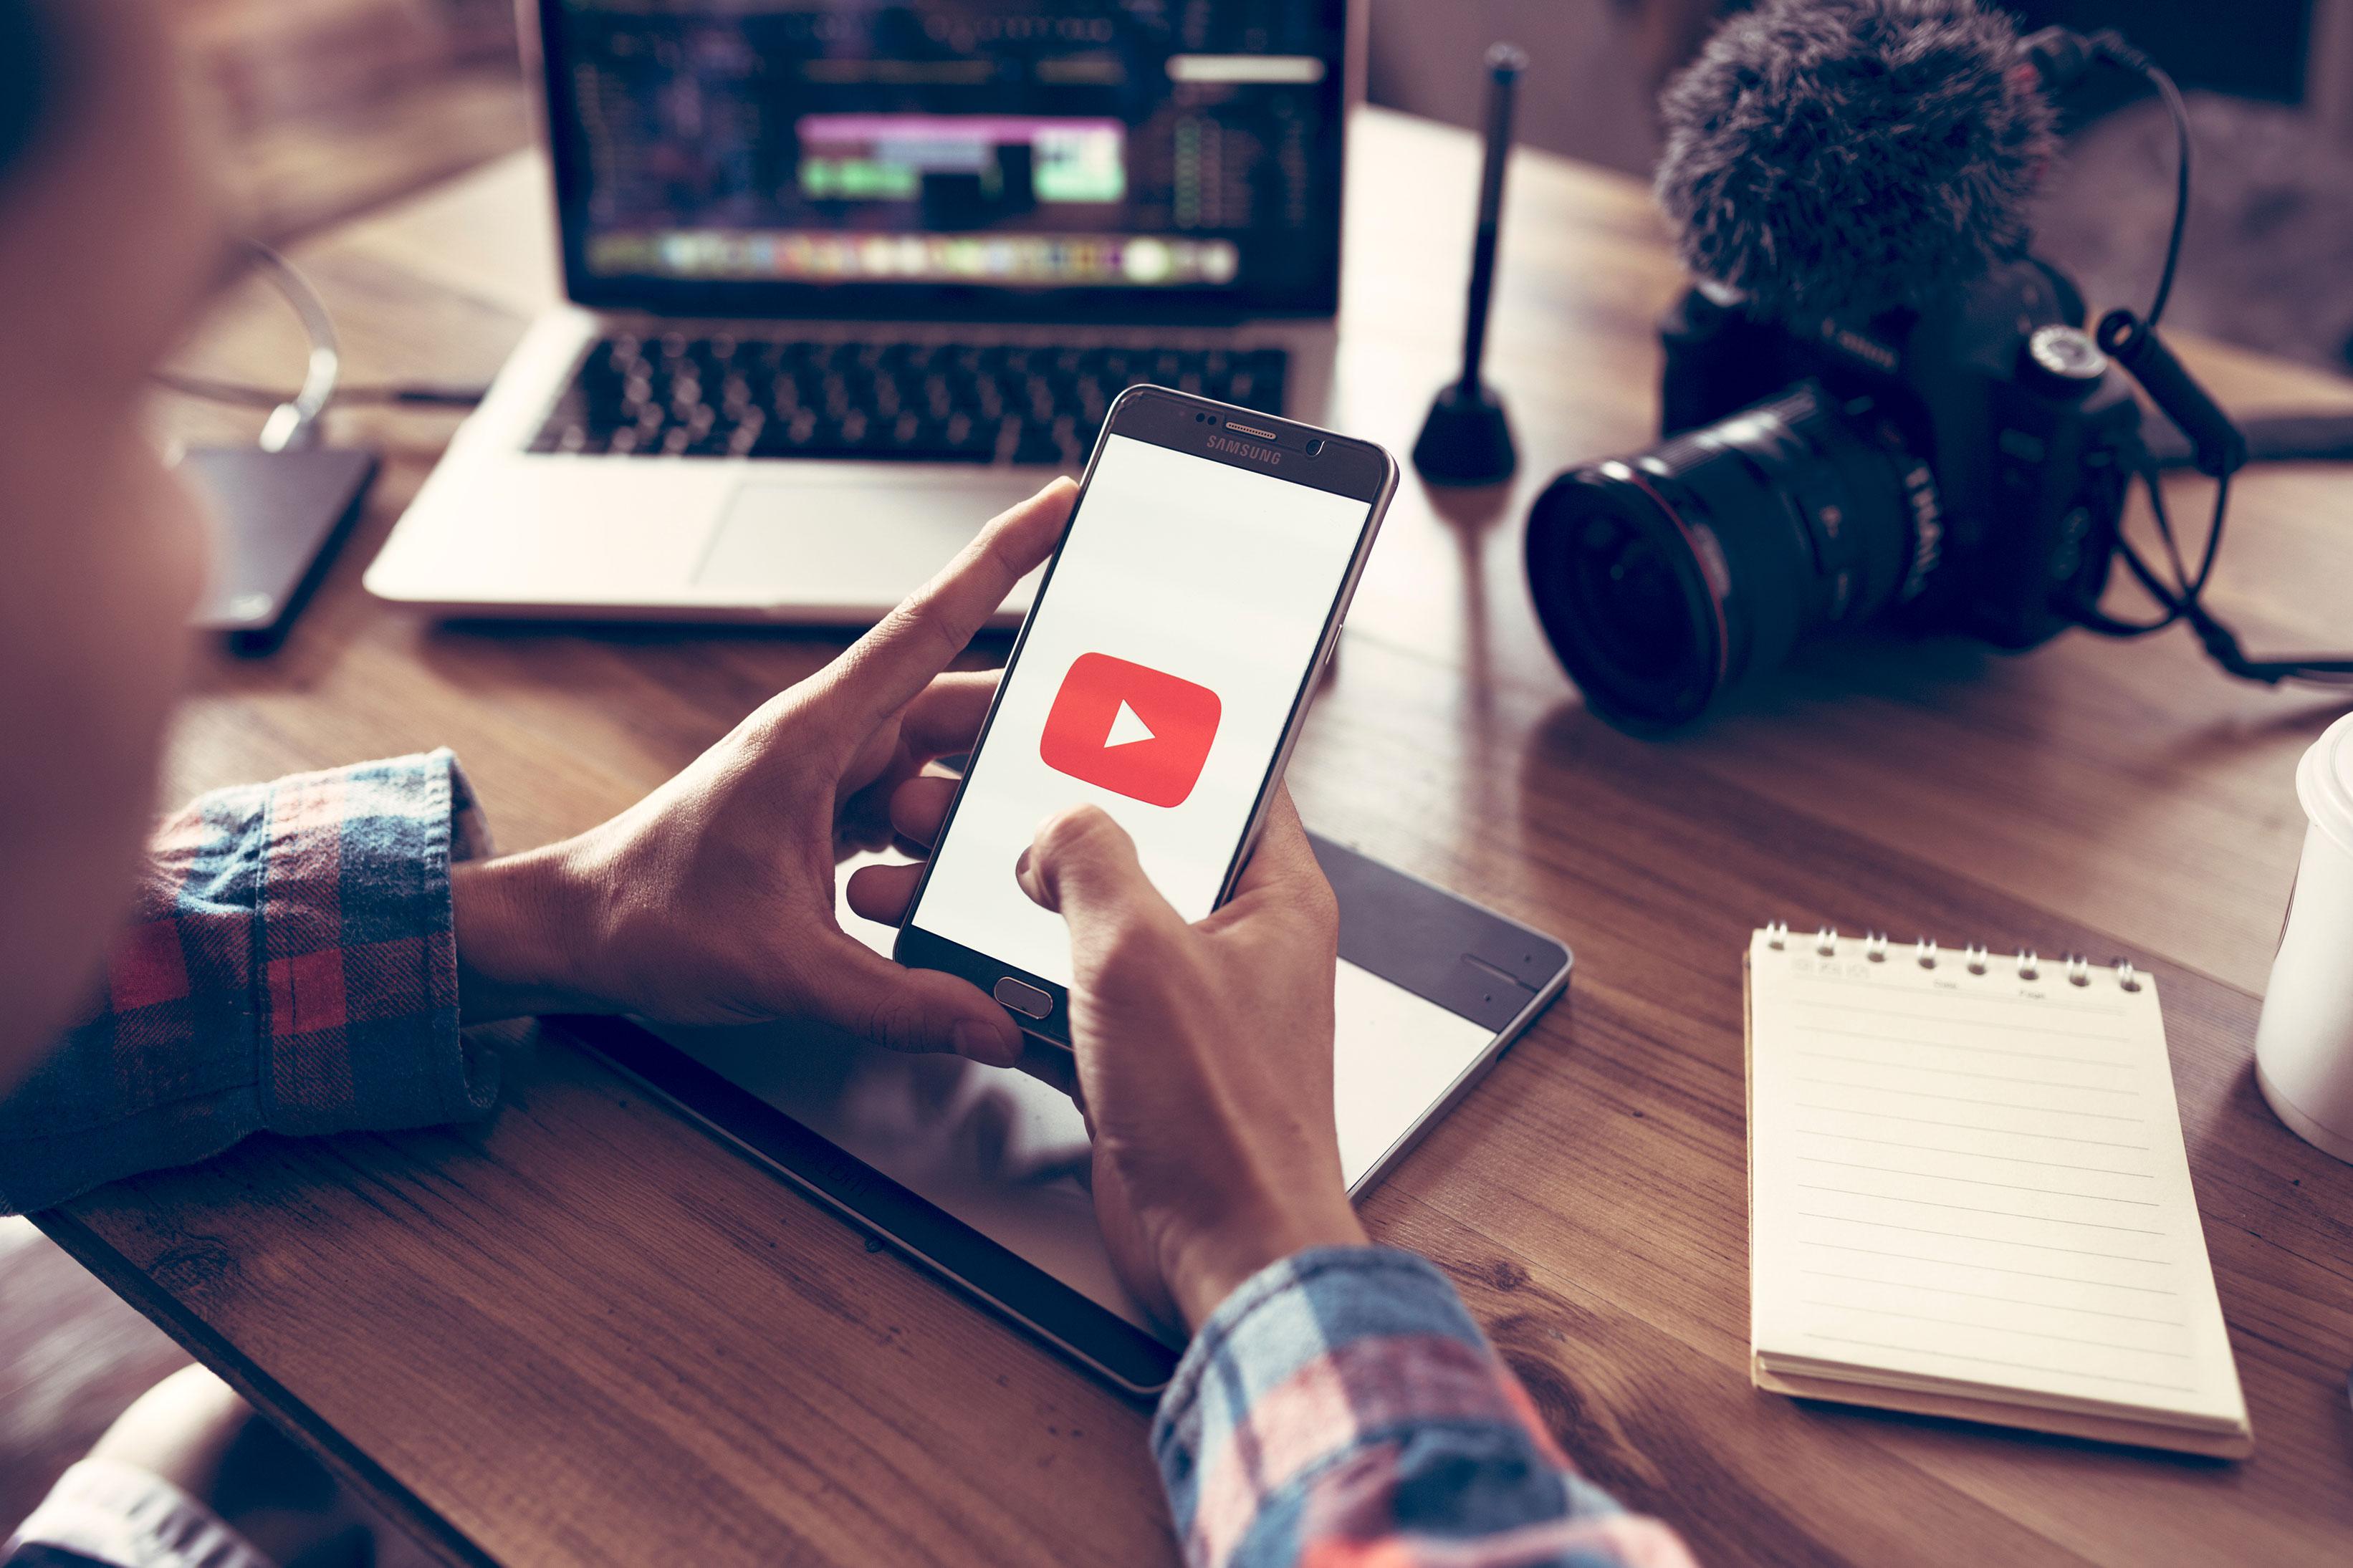 YouTube SEO basics video SEO brand marketing video marekting